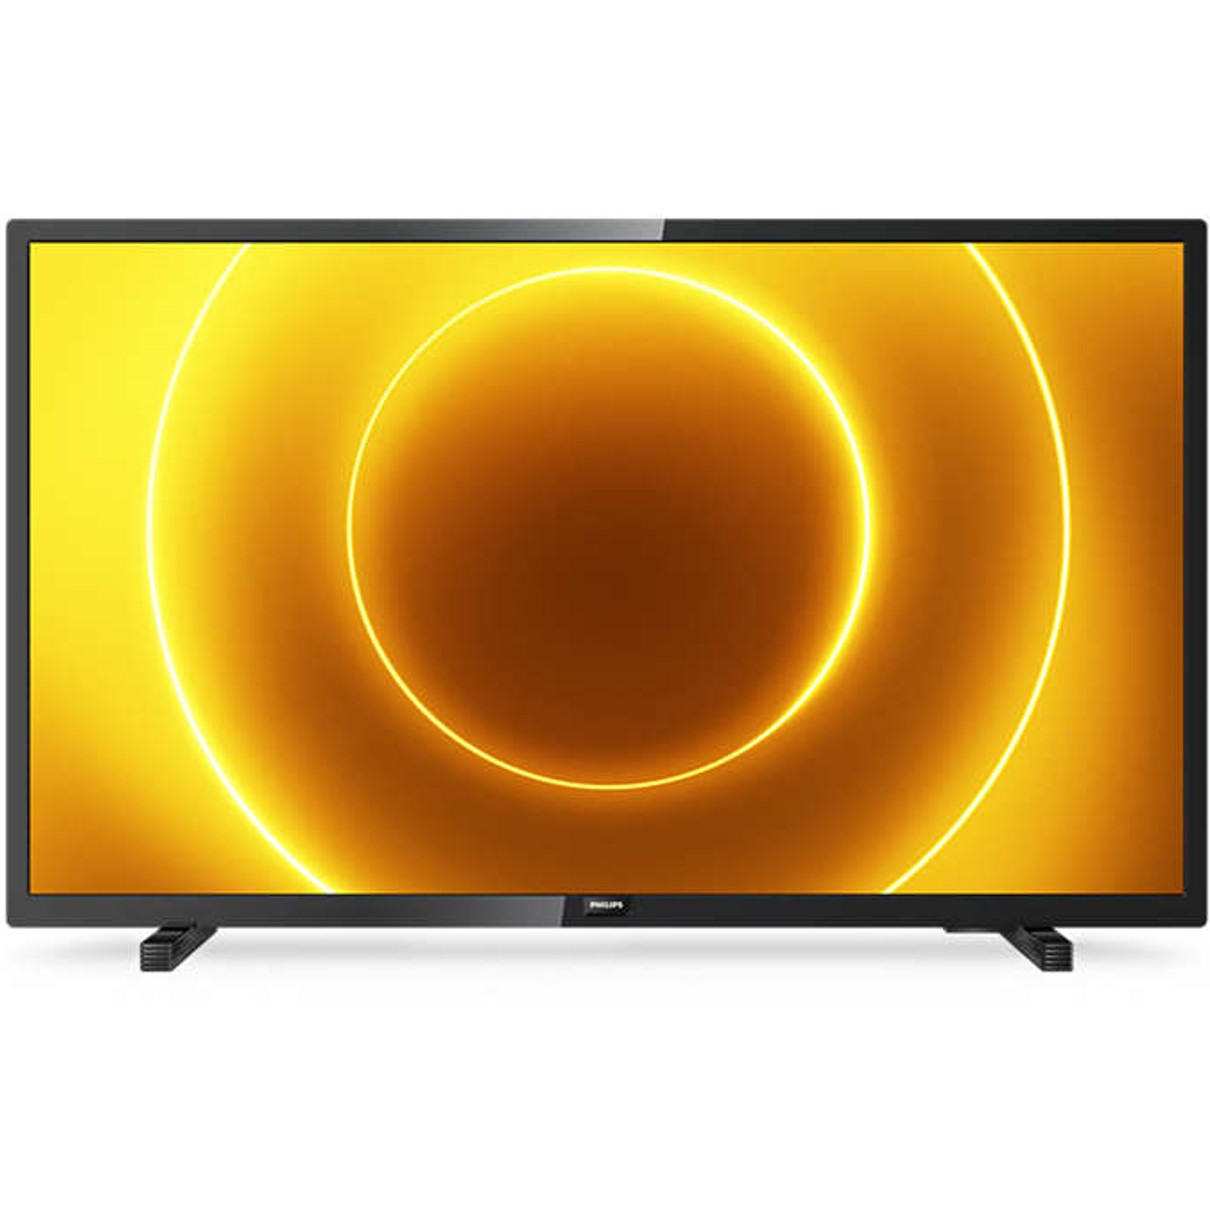 "TV SAMSUNG 32"" LED HD READY/ 32PHS5505/ 2 HDMI/ 1 USB/ DVB-T/T2/T2-HD/C/S/S2"